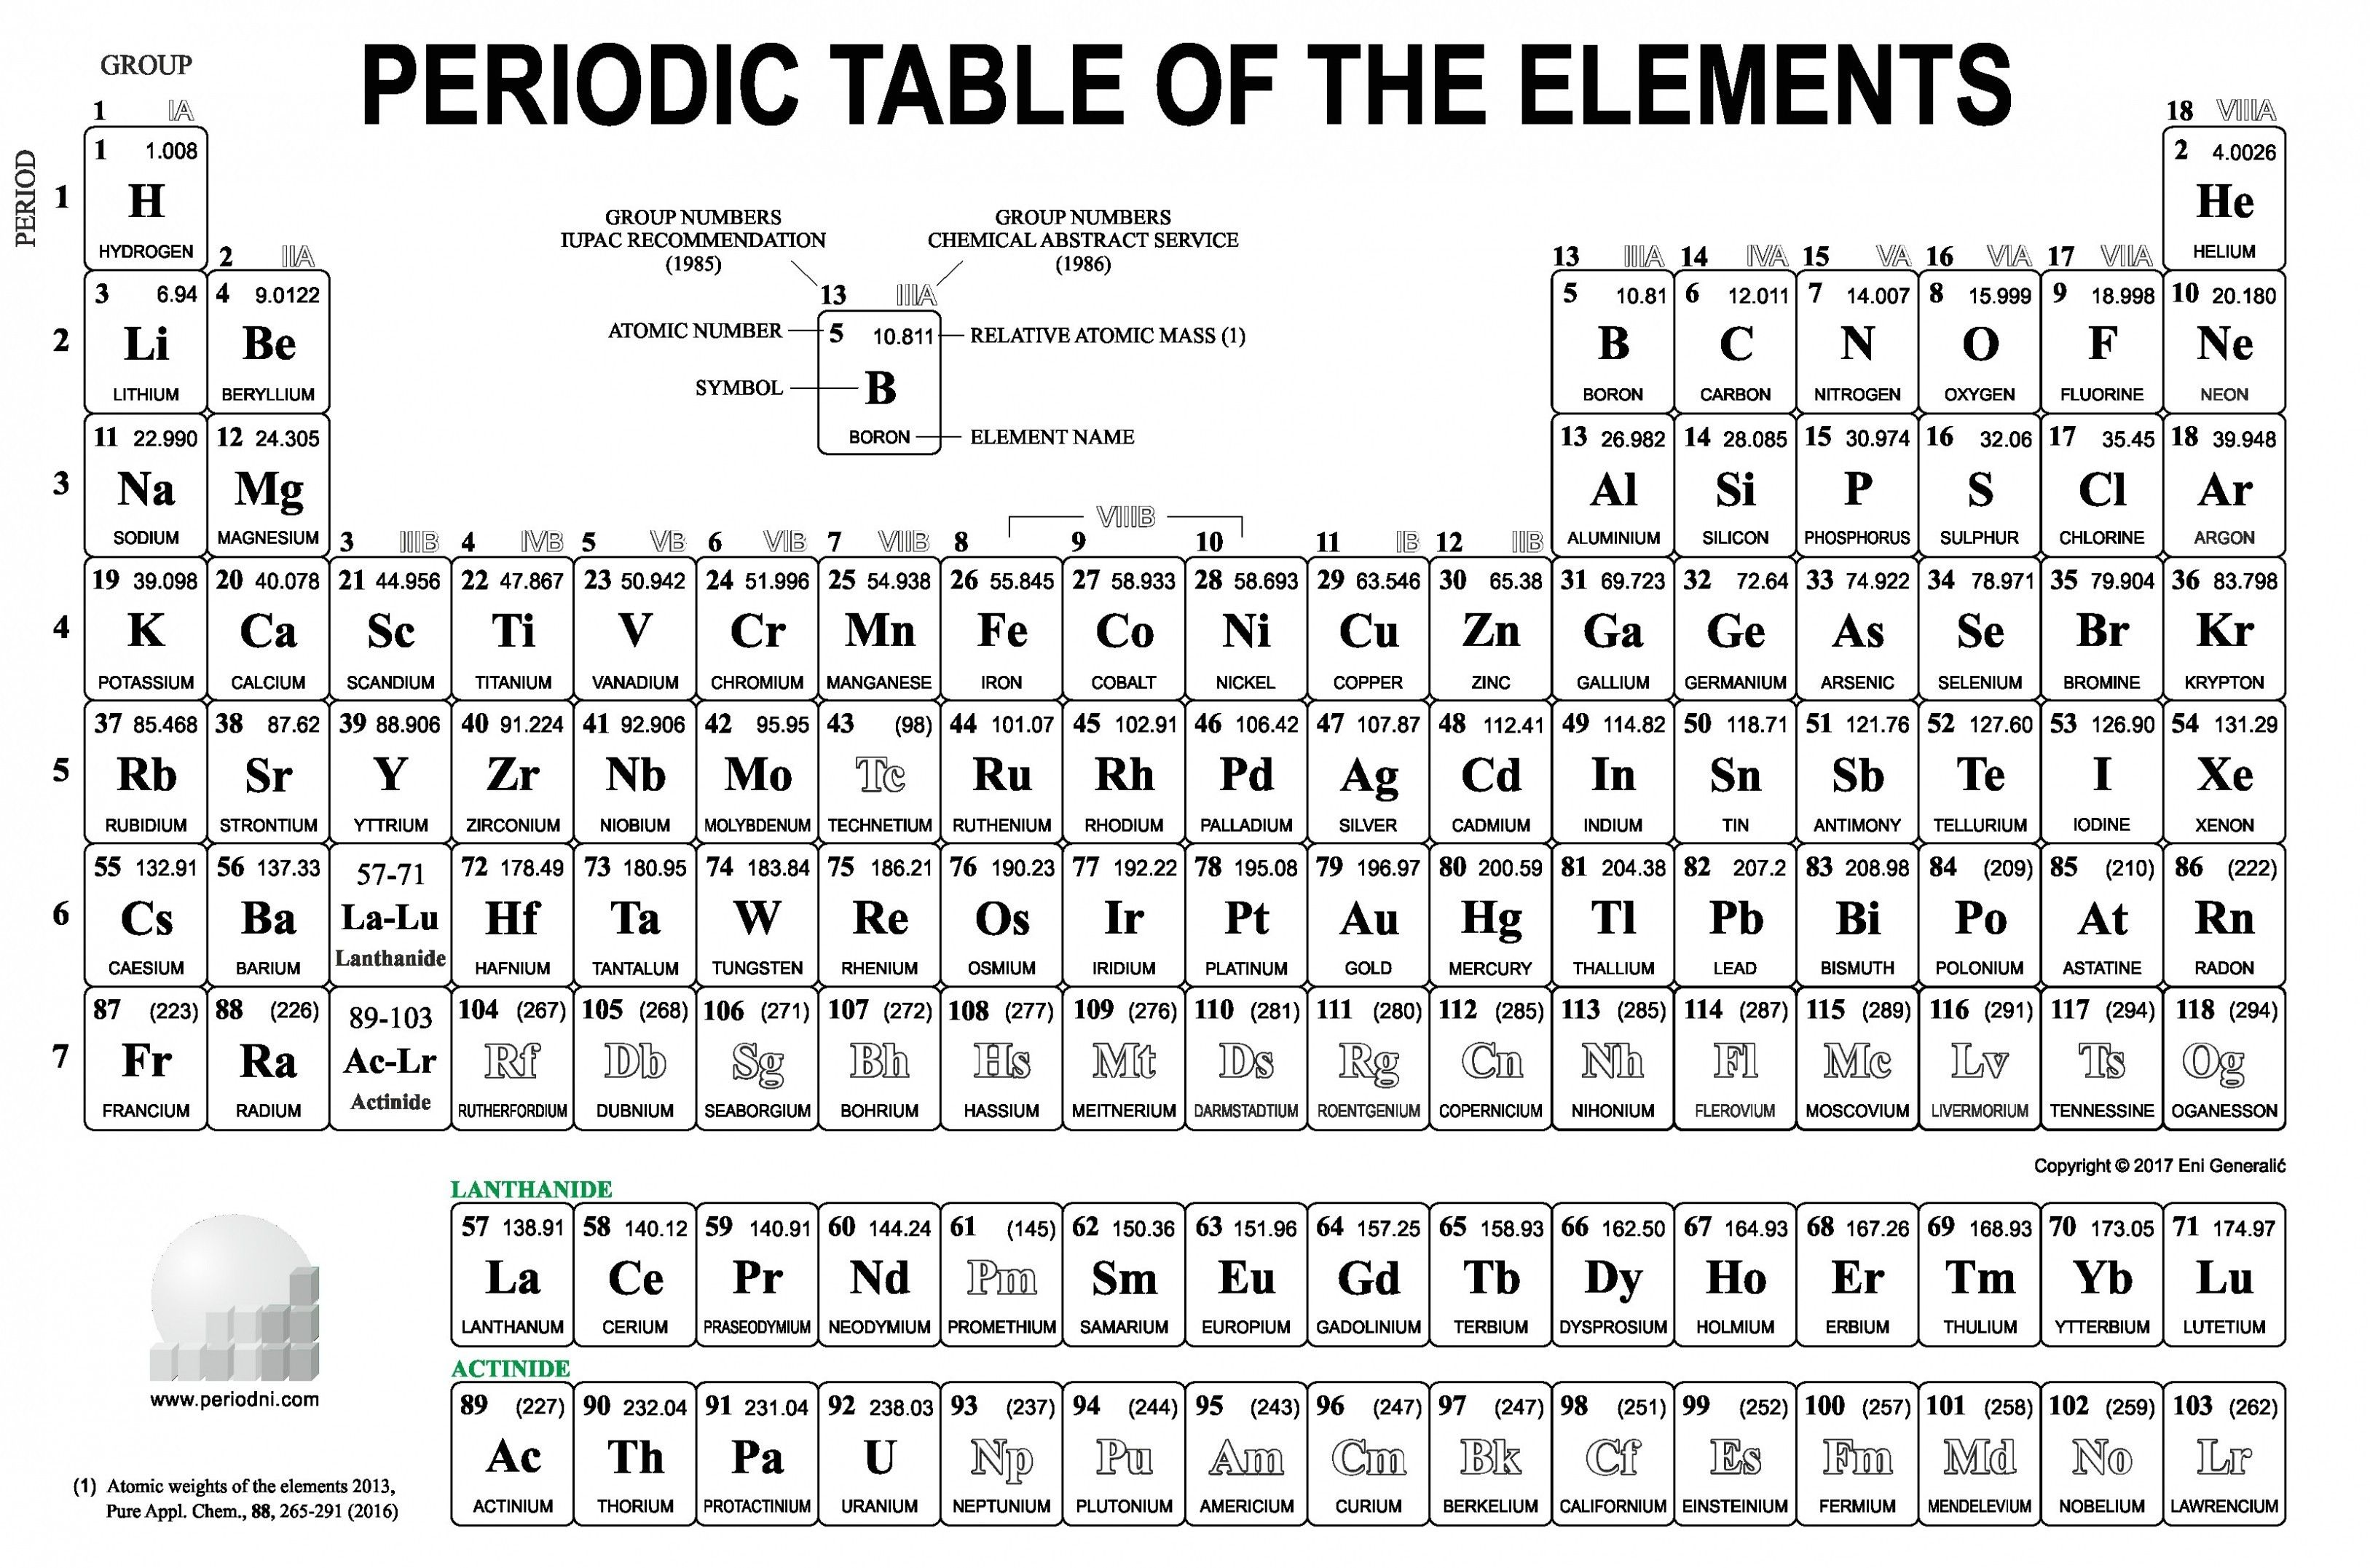 Unique Periodic Table Groups Boron